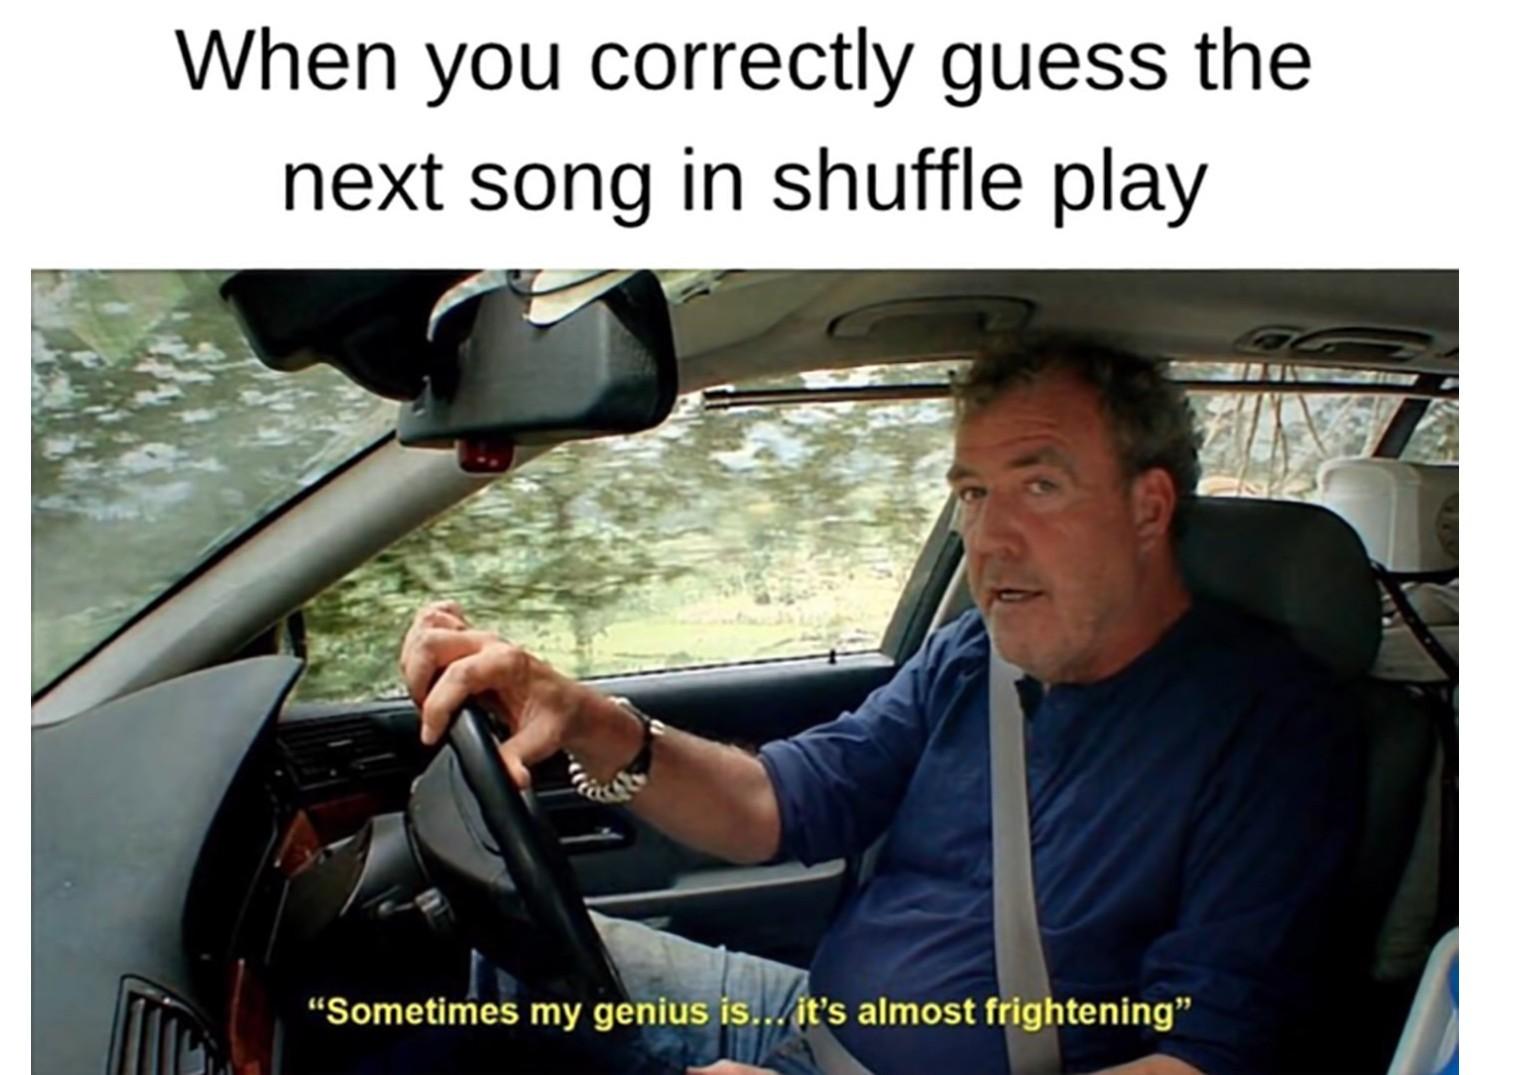 Dongs in a banana - meme